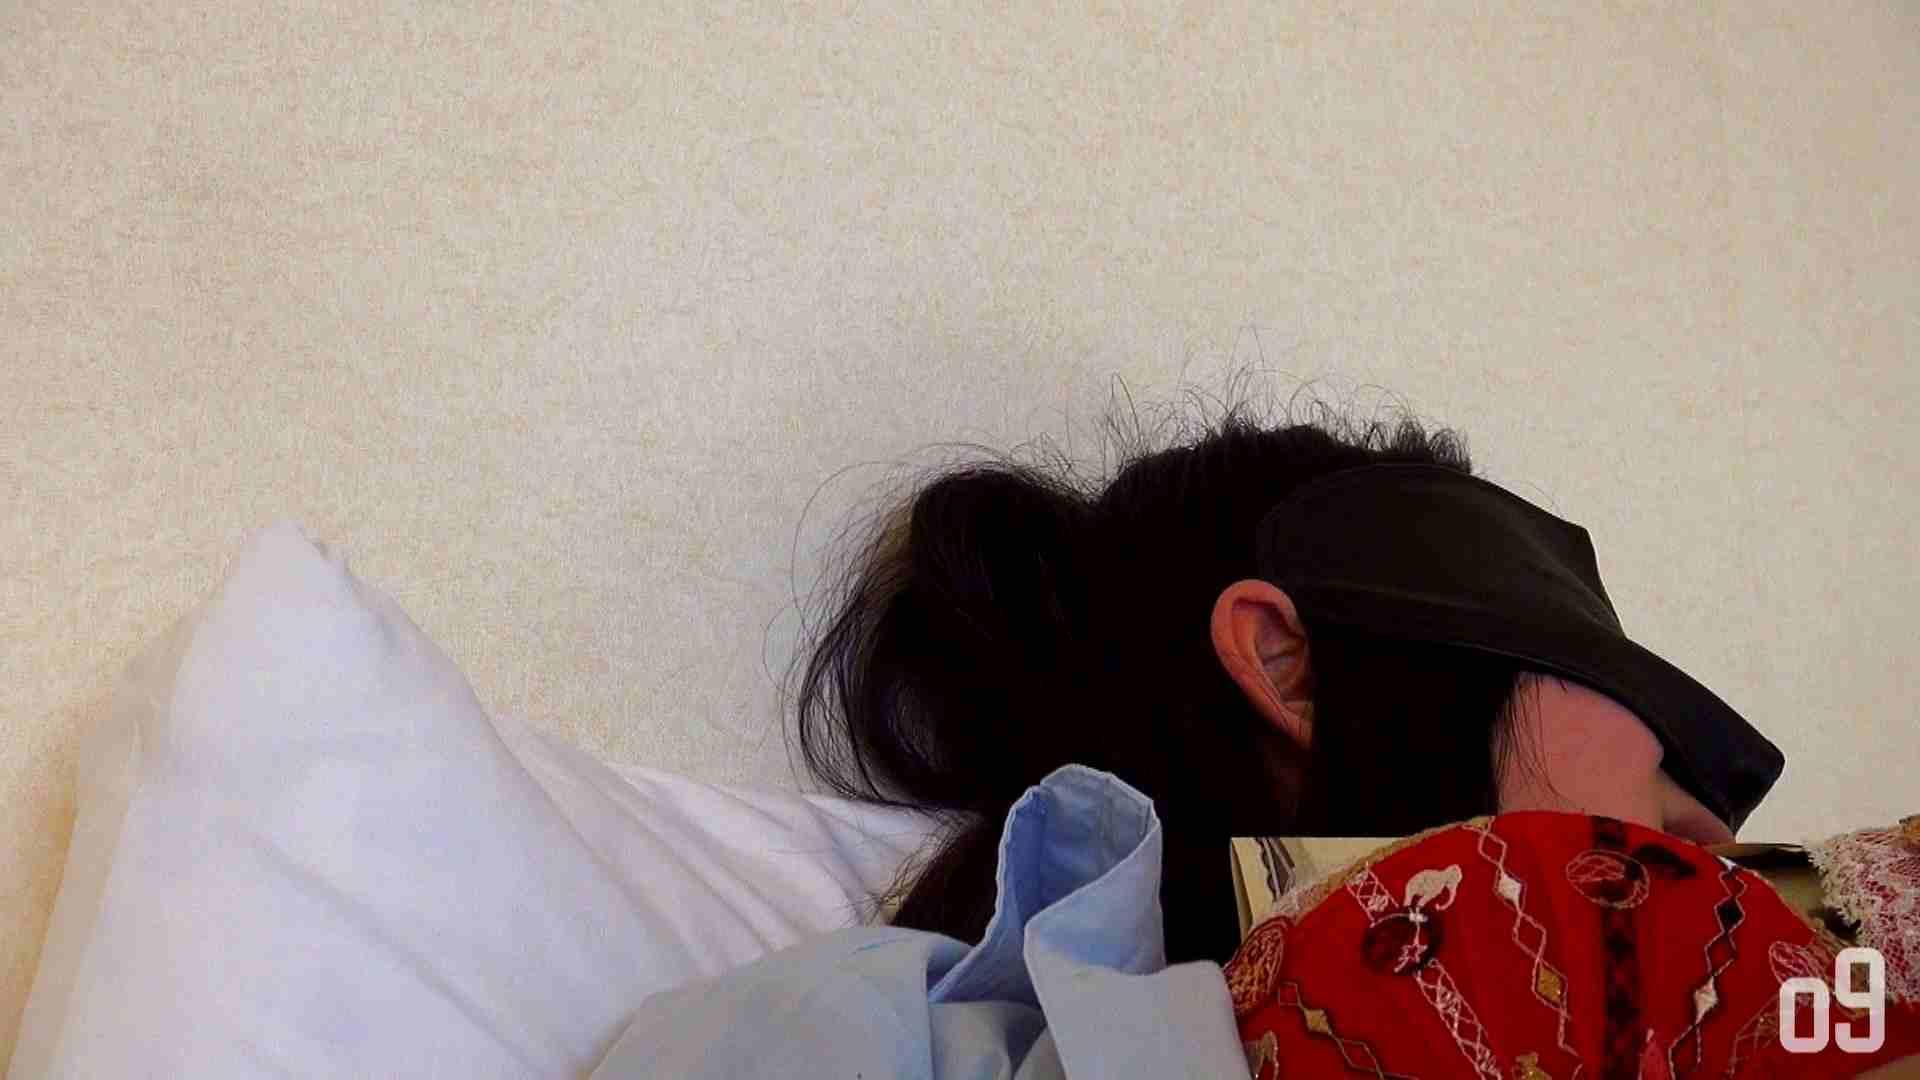 vol.6 TKSさんが震える!留華ちゃんの不慣れな手コキで念願の射精! 顔出しNG一般女性 | エッチなOL  99pic 15